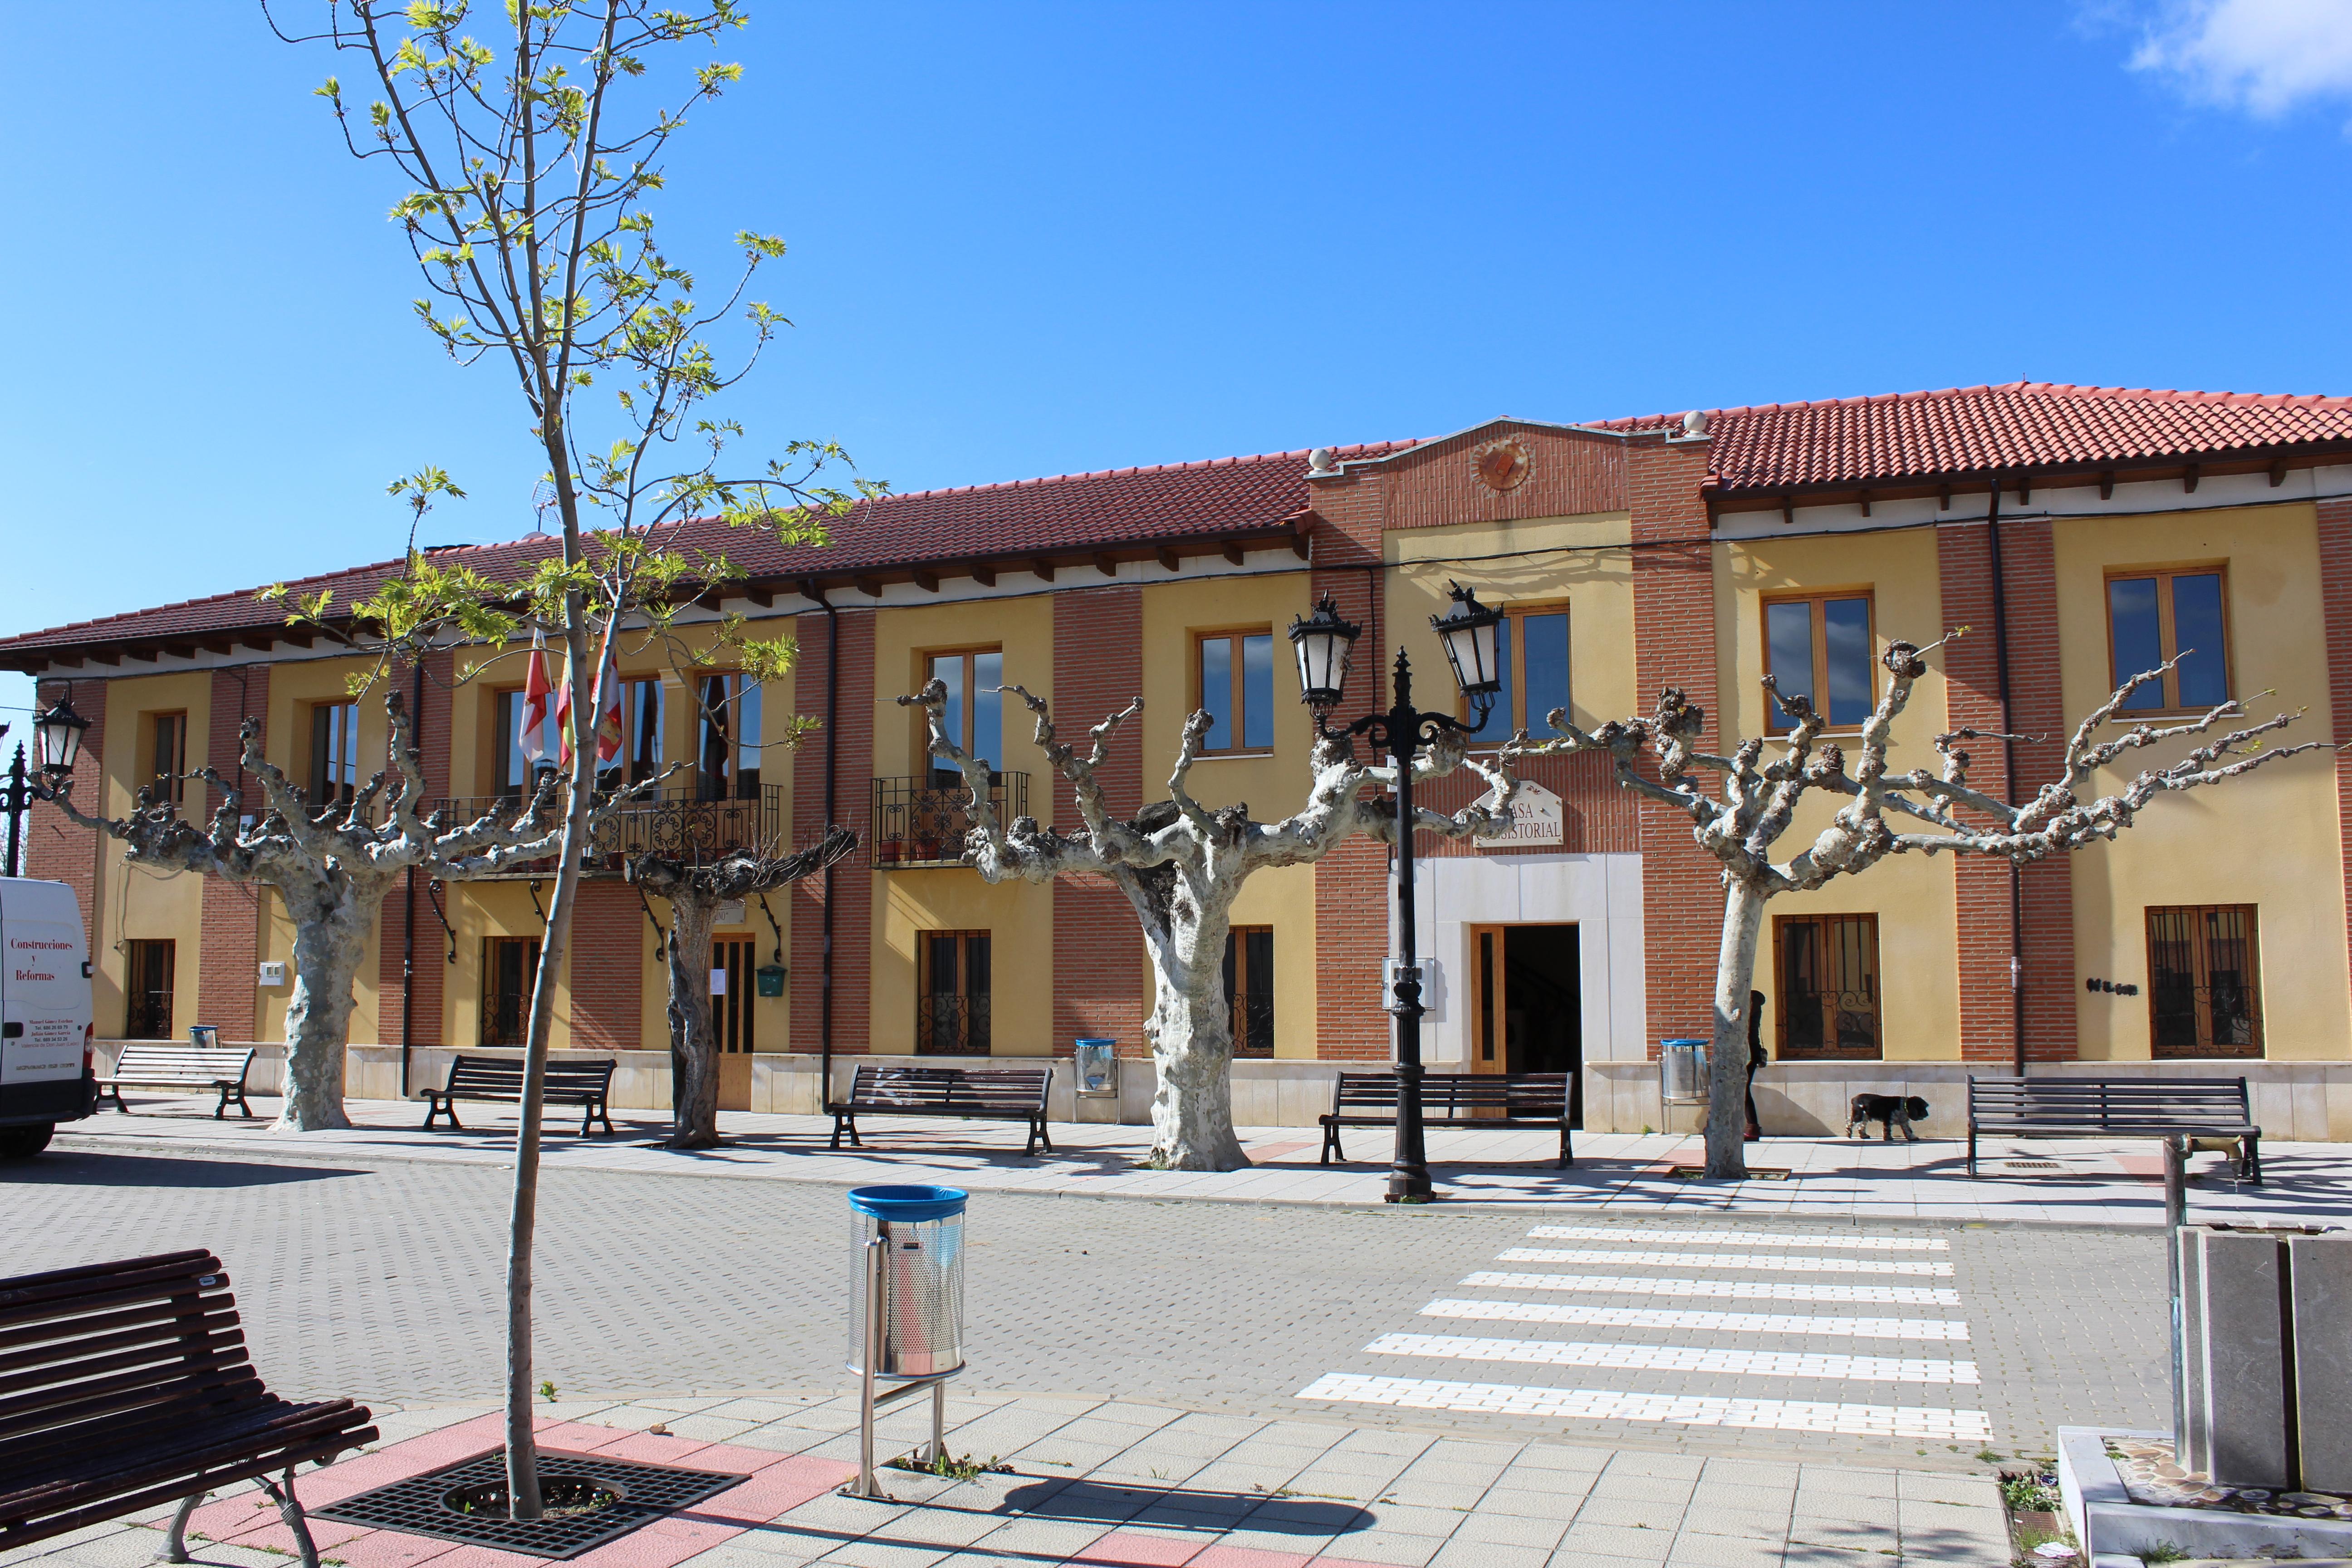 Depiction of Fresno de la Vega